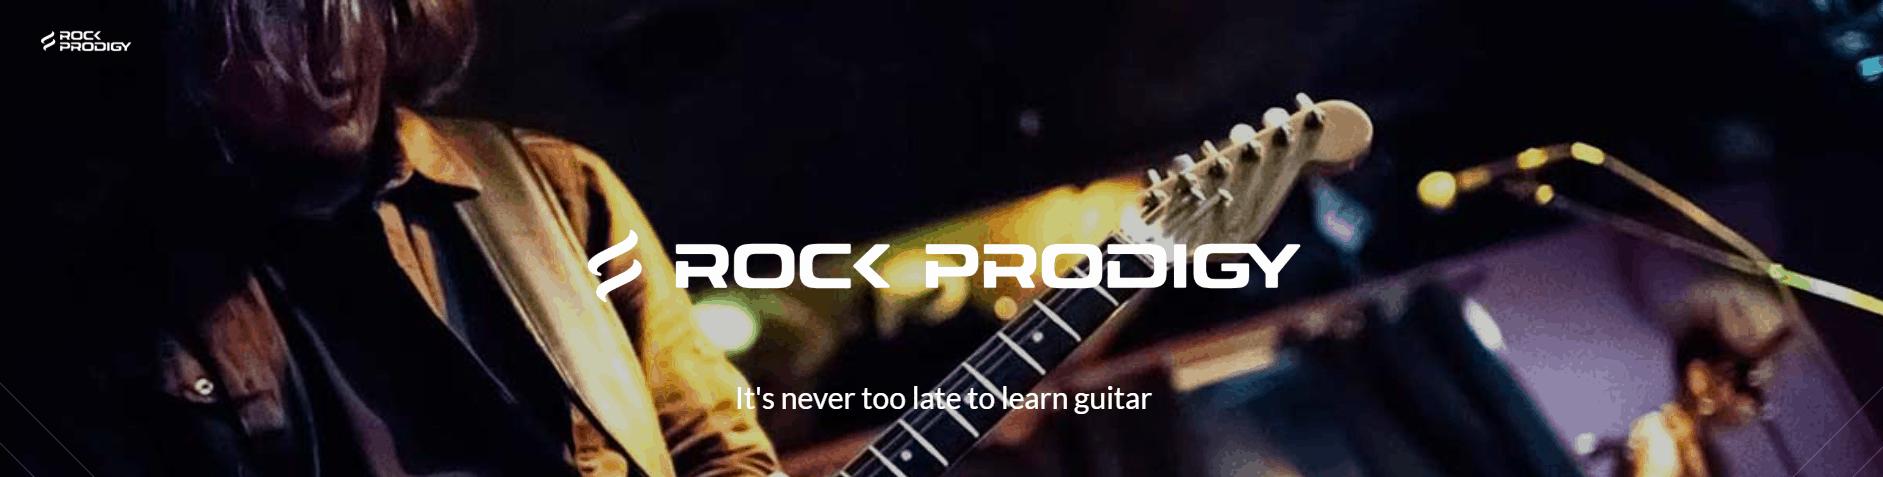 Rock Prodigy website